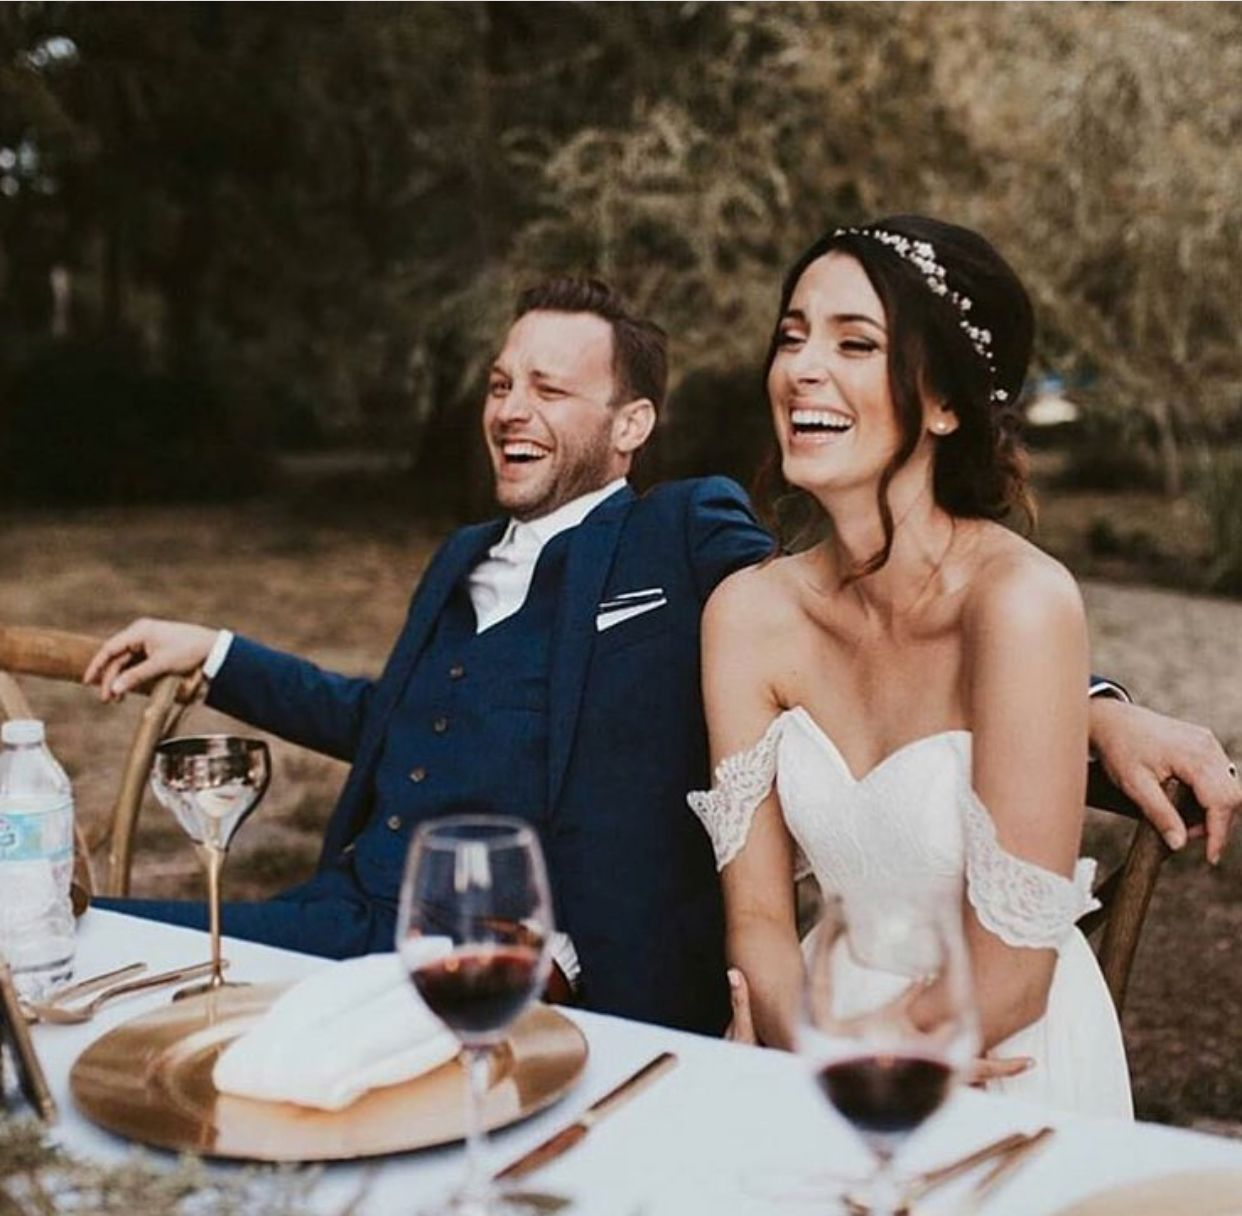 Pin by marcela molina on wedding pinterest wedding weddings and